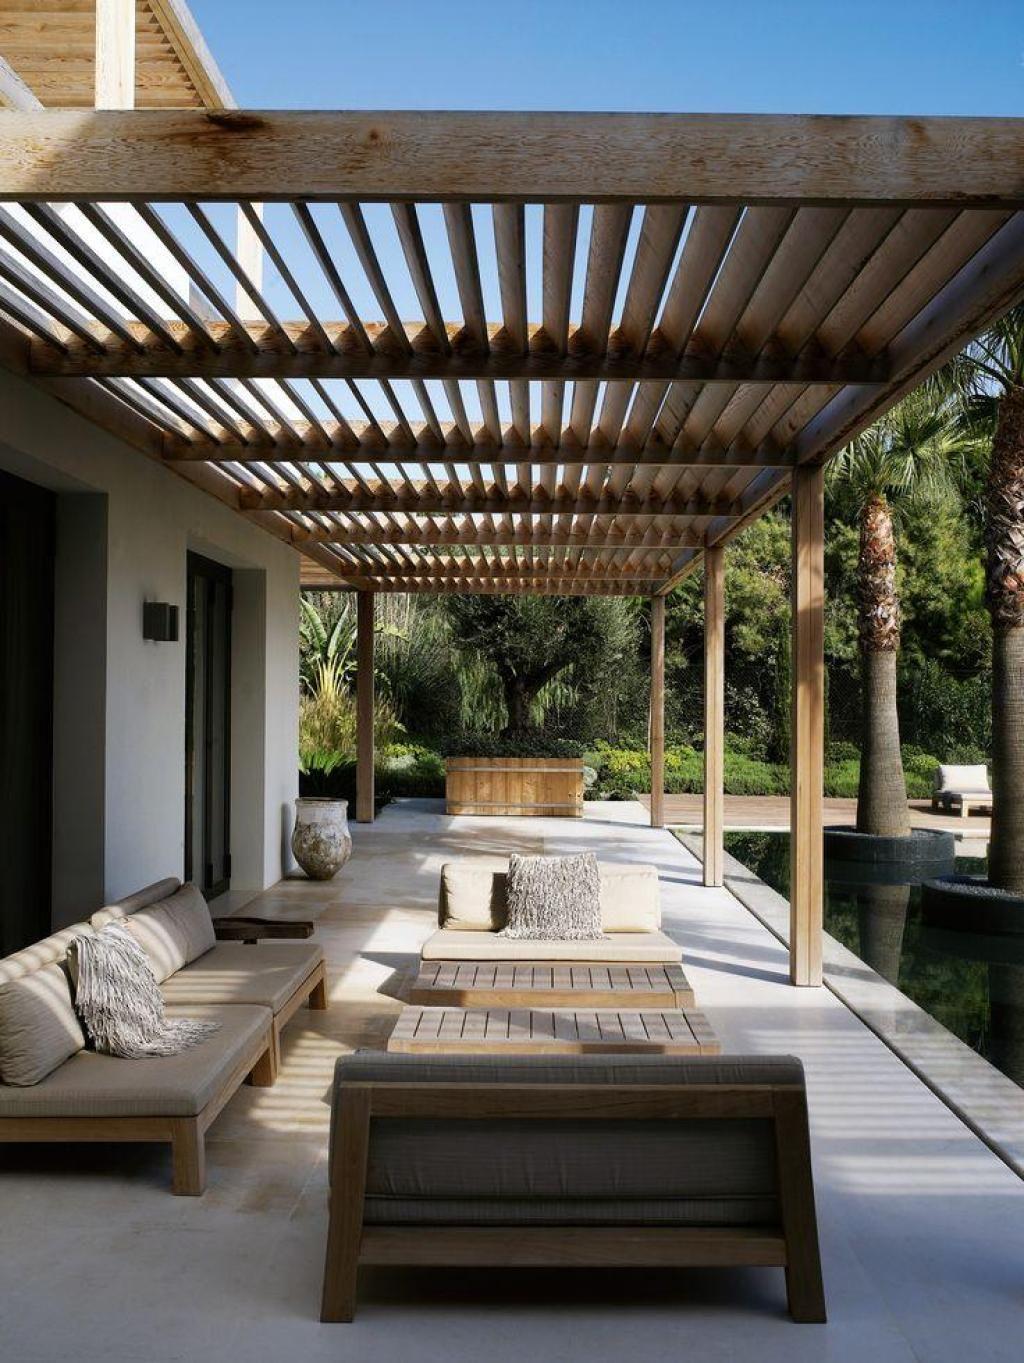 Brilliant 25 Best Modern Pergola Designs Gallery Inspiration Https Decorisme Co 2017 09 28 25 Best Modern Patio Design Modern Pergola Designs Modern Pergola Backyard modern pergola ideas